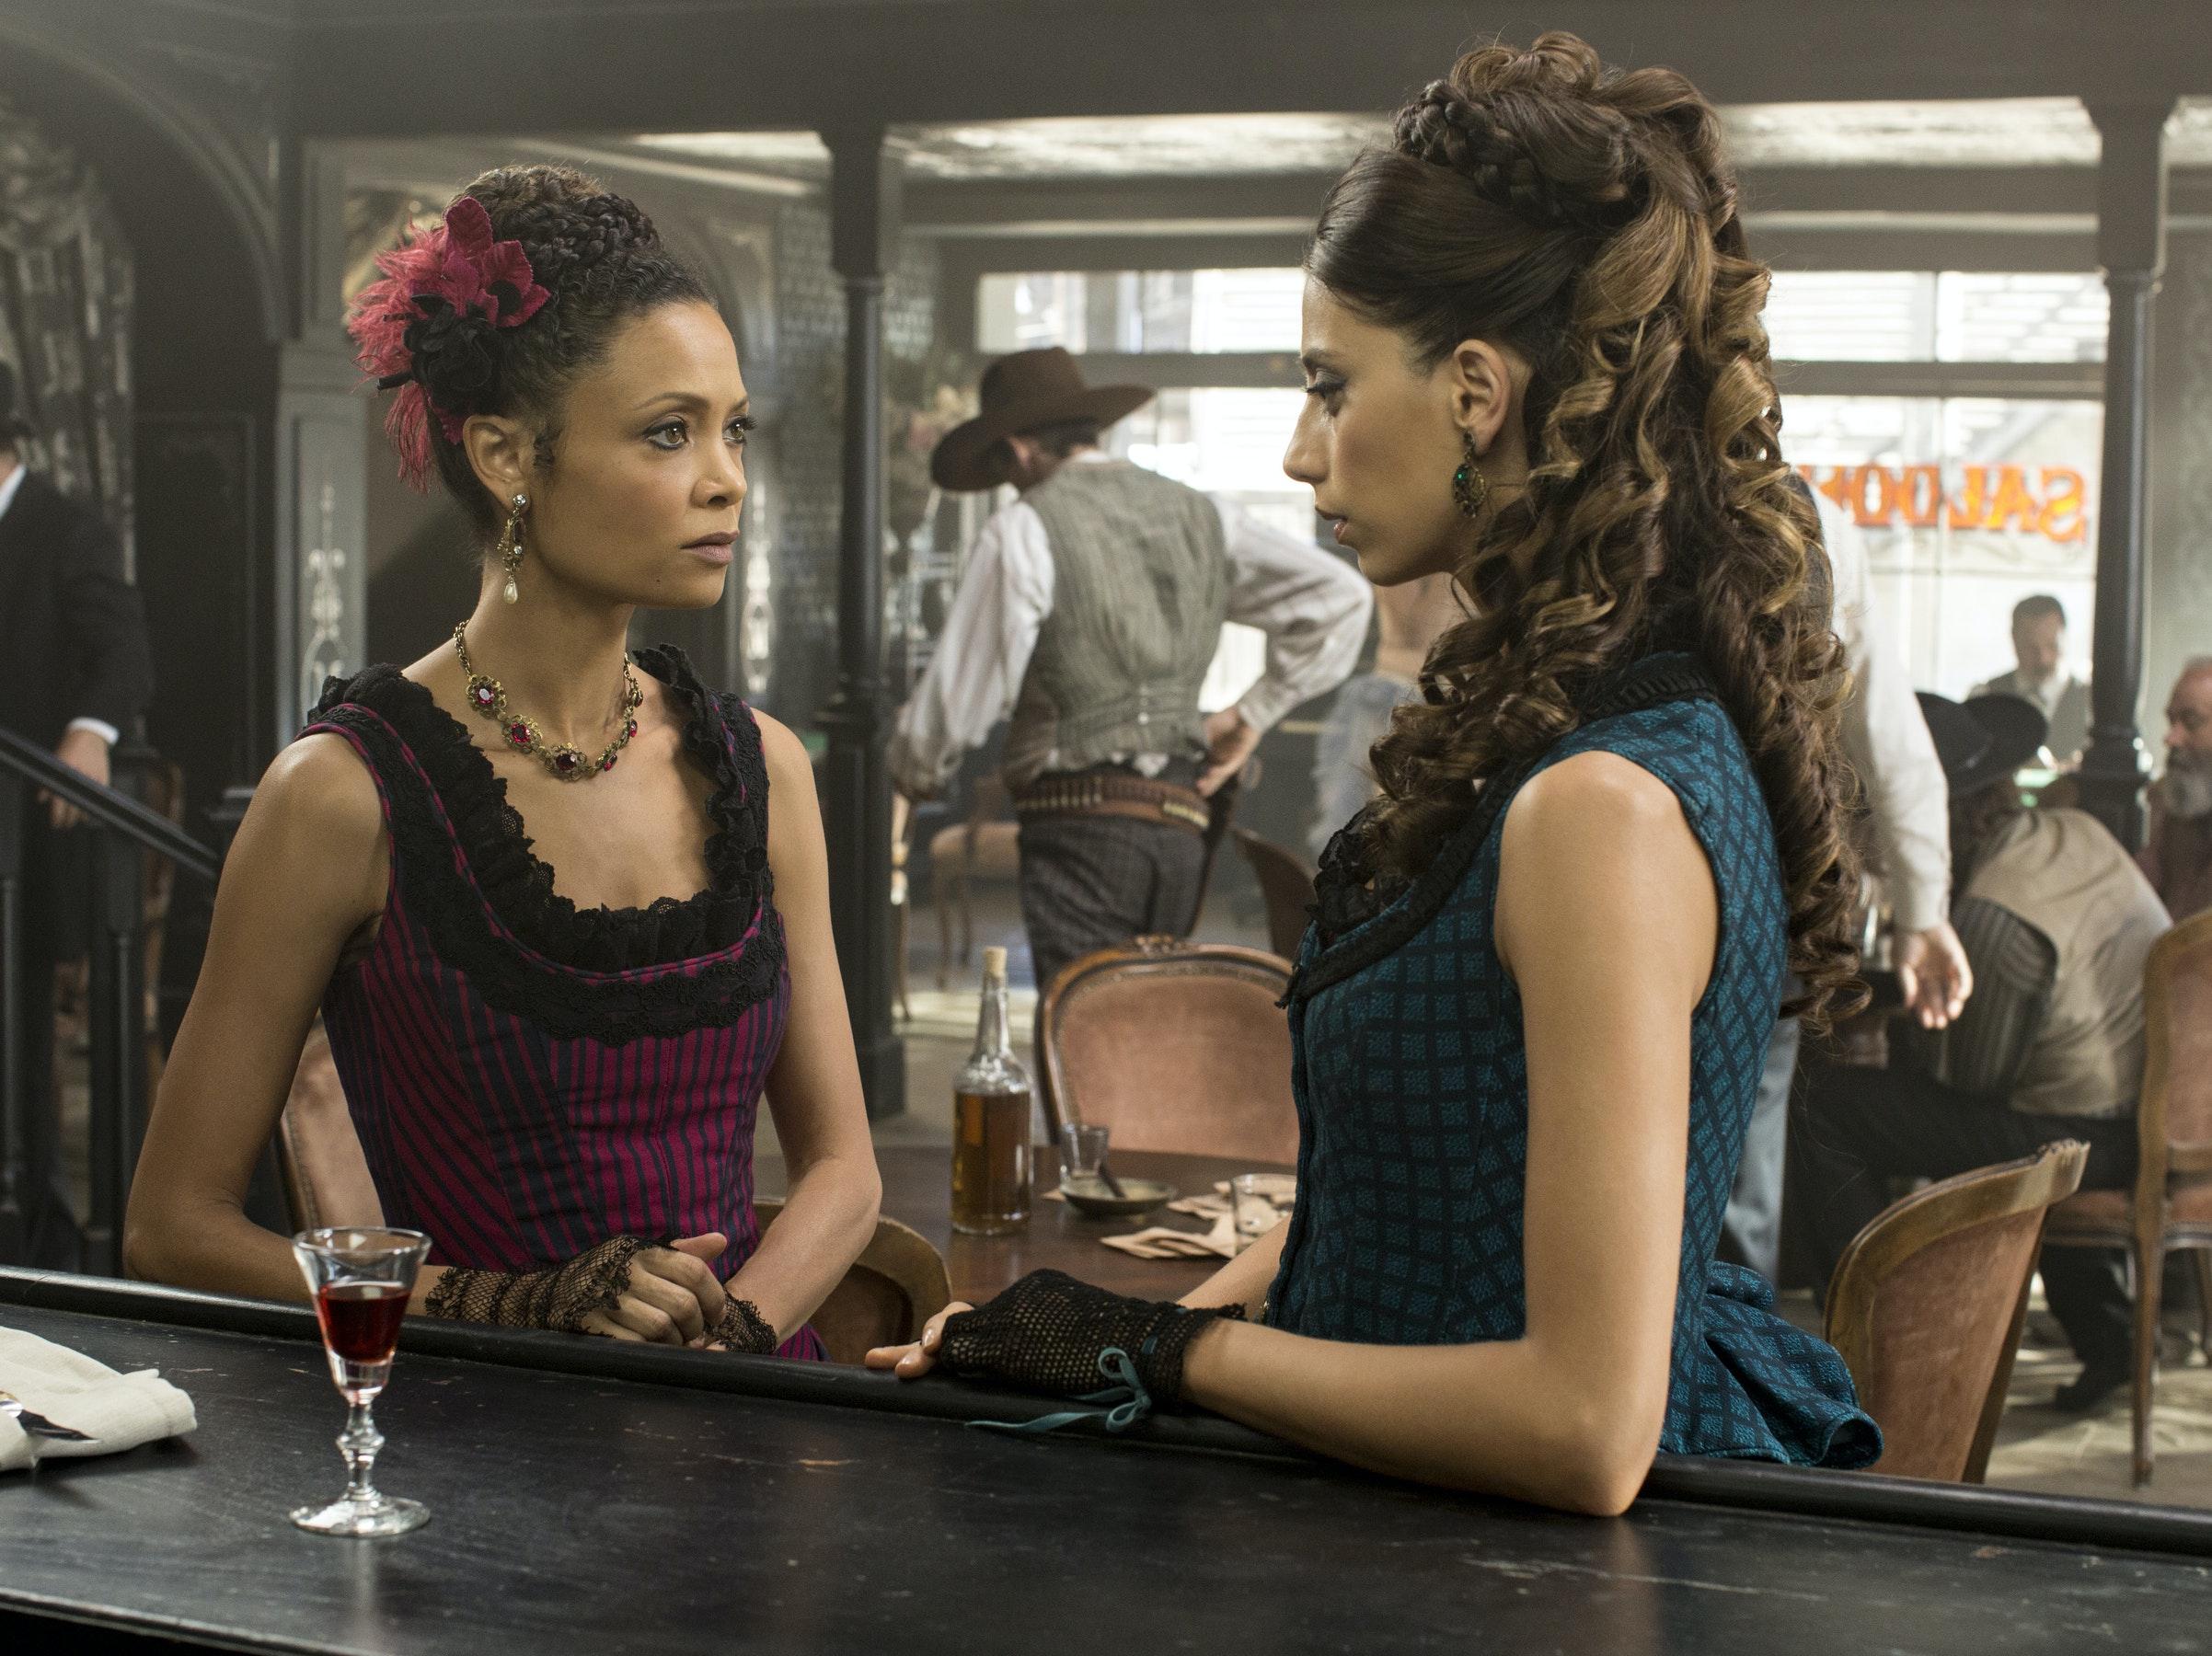 Twists Aside, Westworld's Greatest Success Is Female Agency